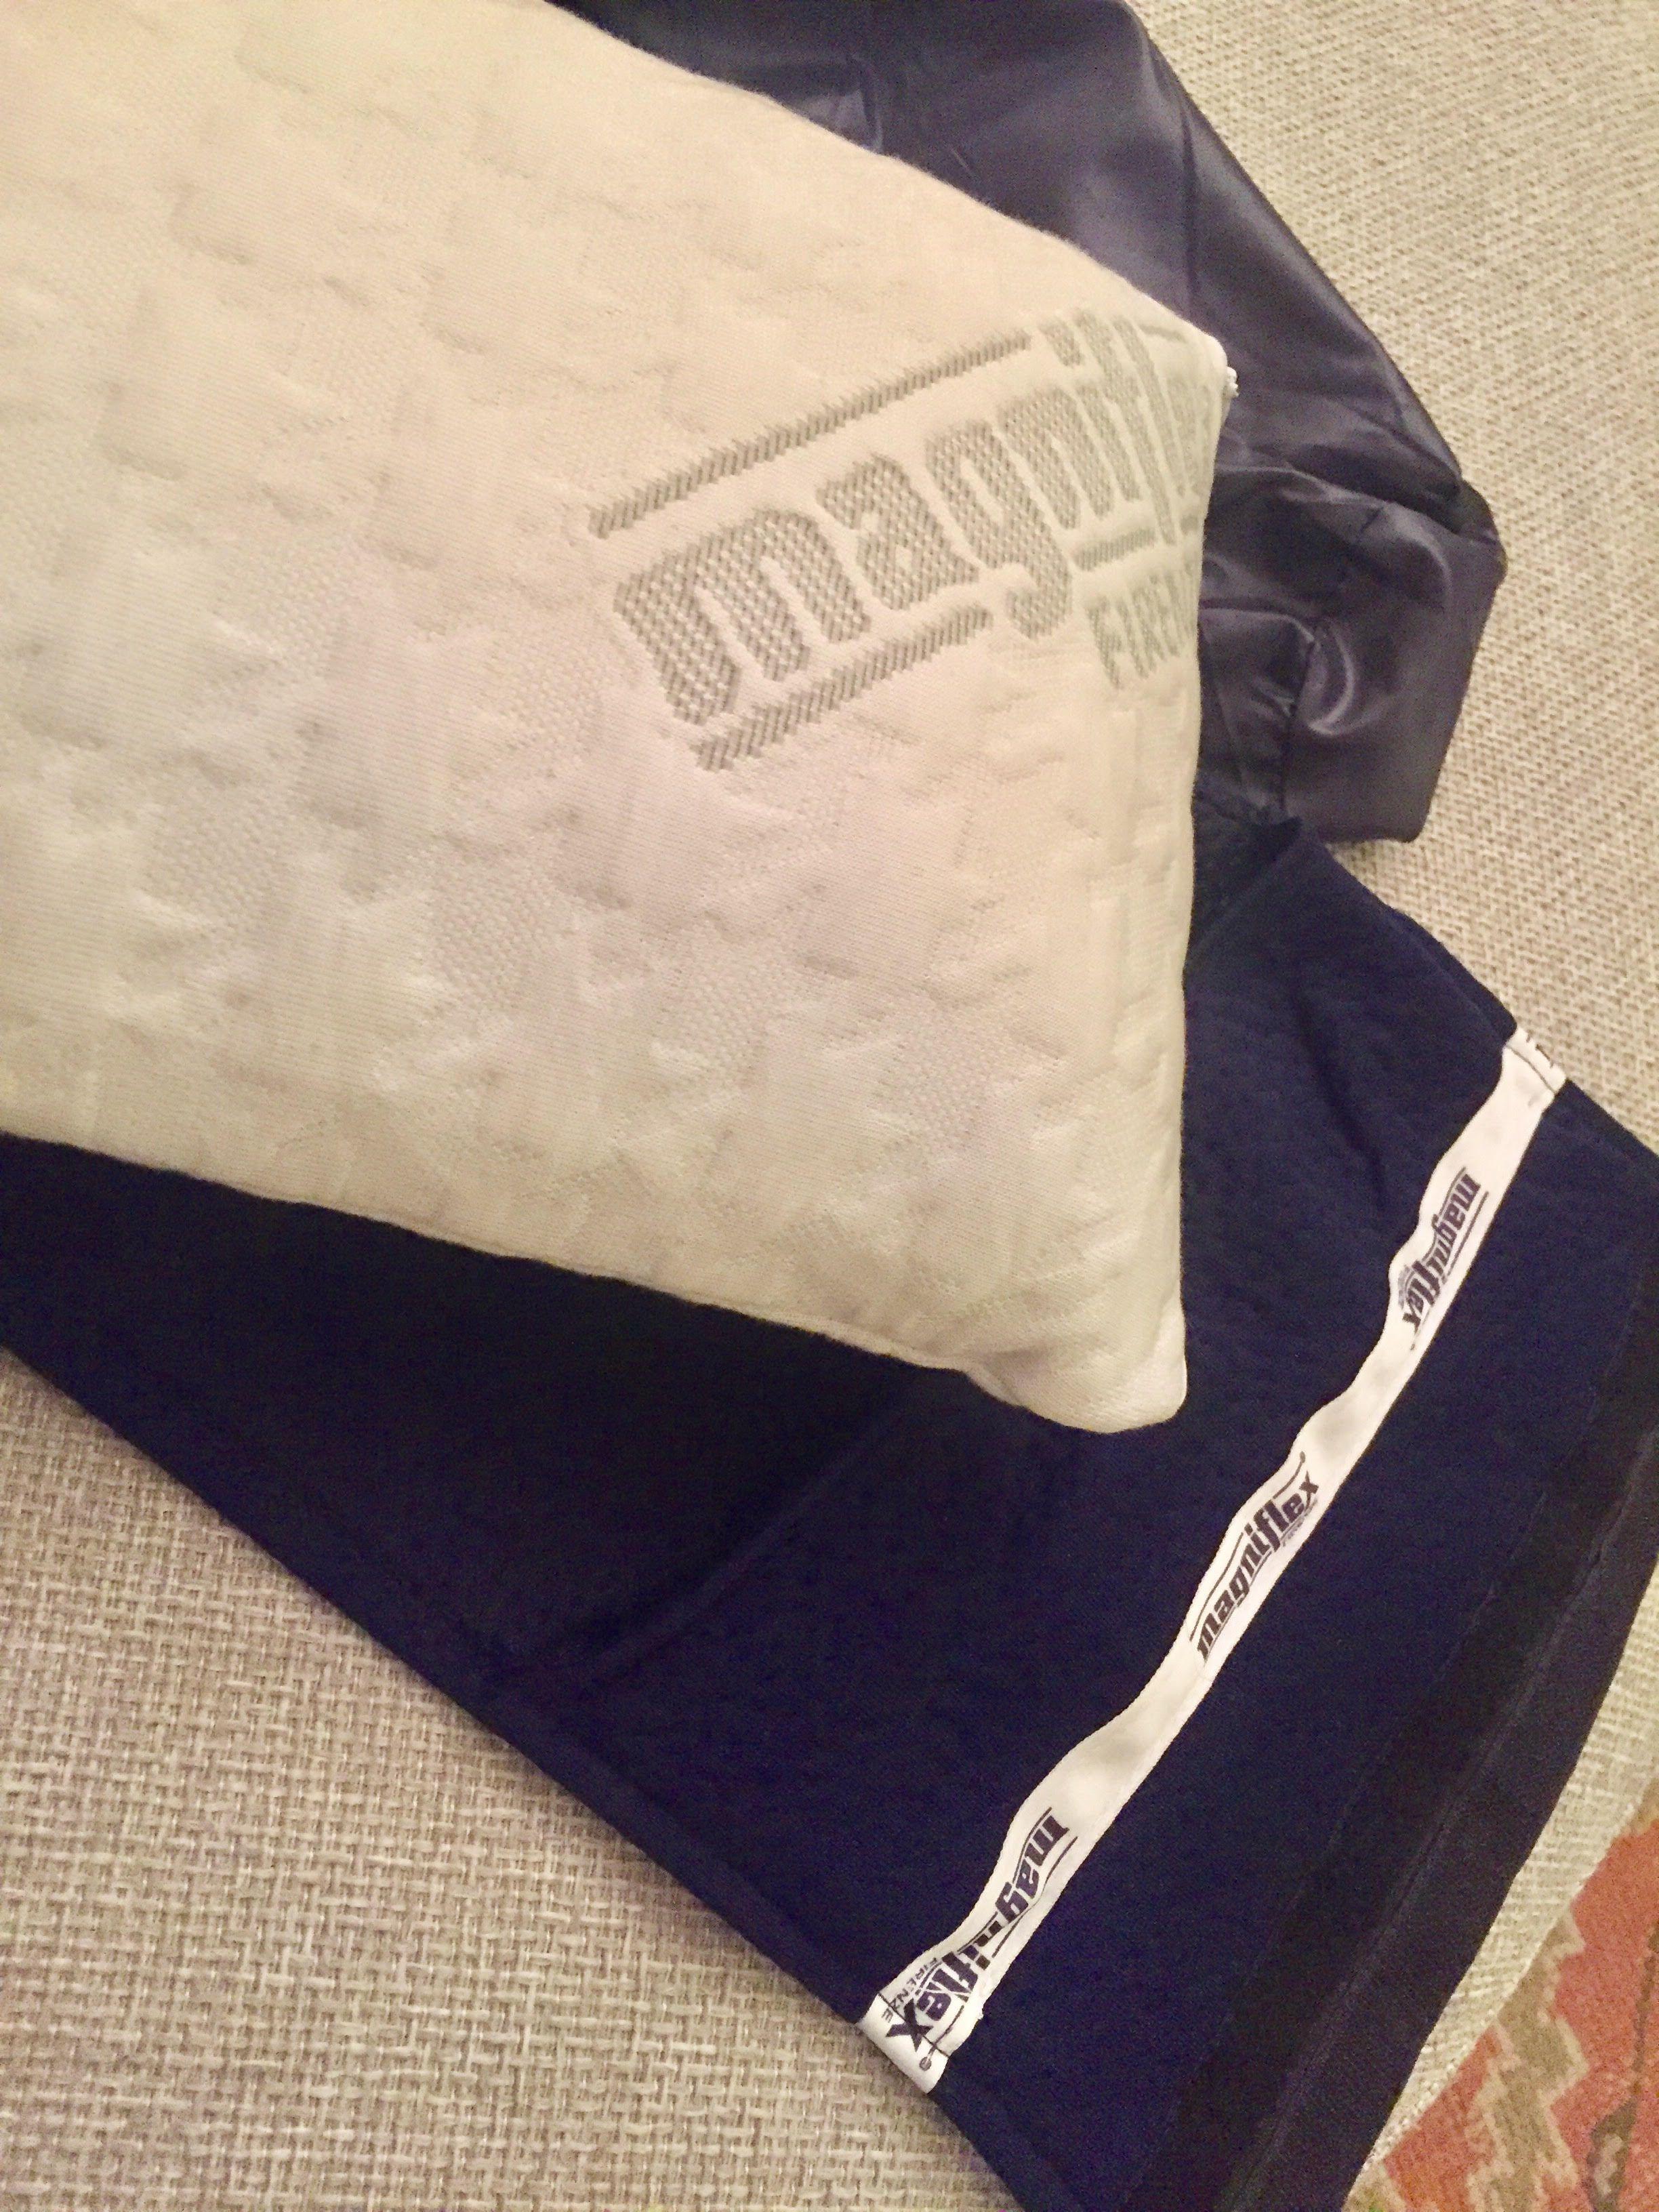 Cuscini Magniflex.Sushi Pillow Magniflex Viaggio Cuscino Magniflex Pillow